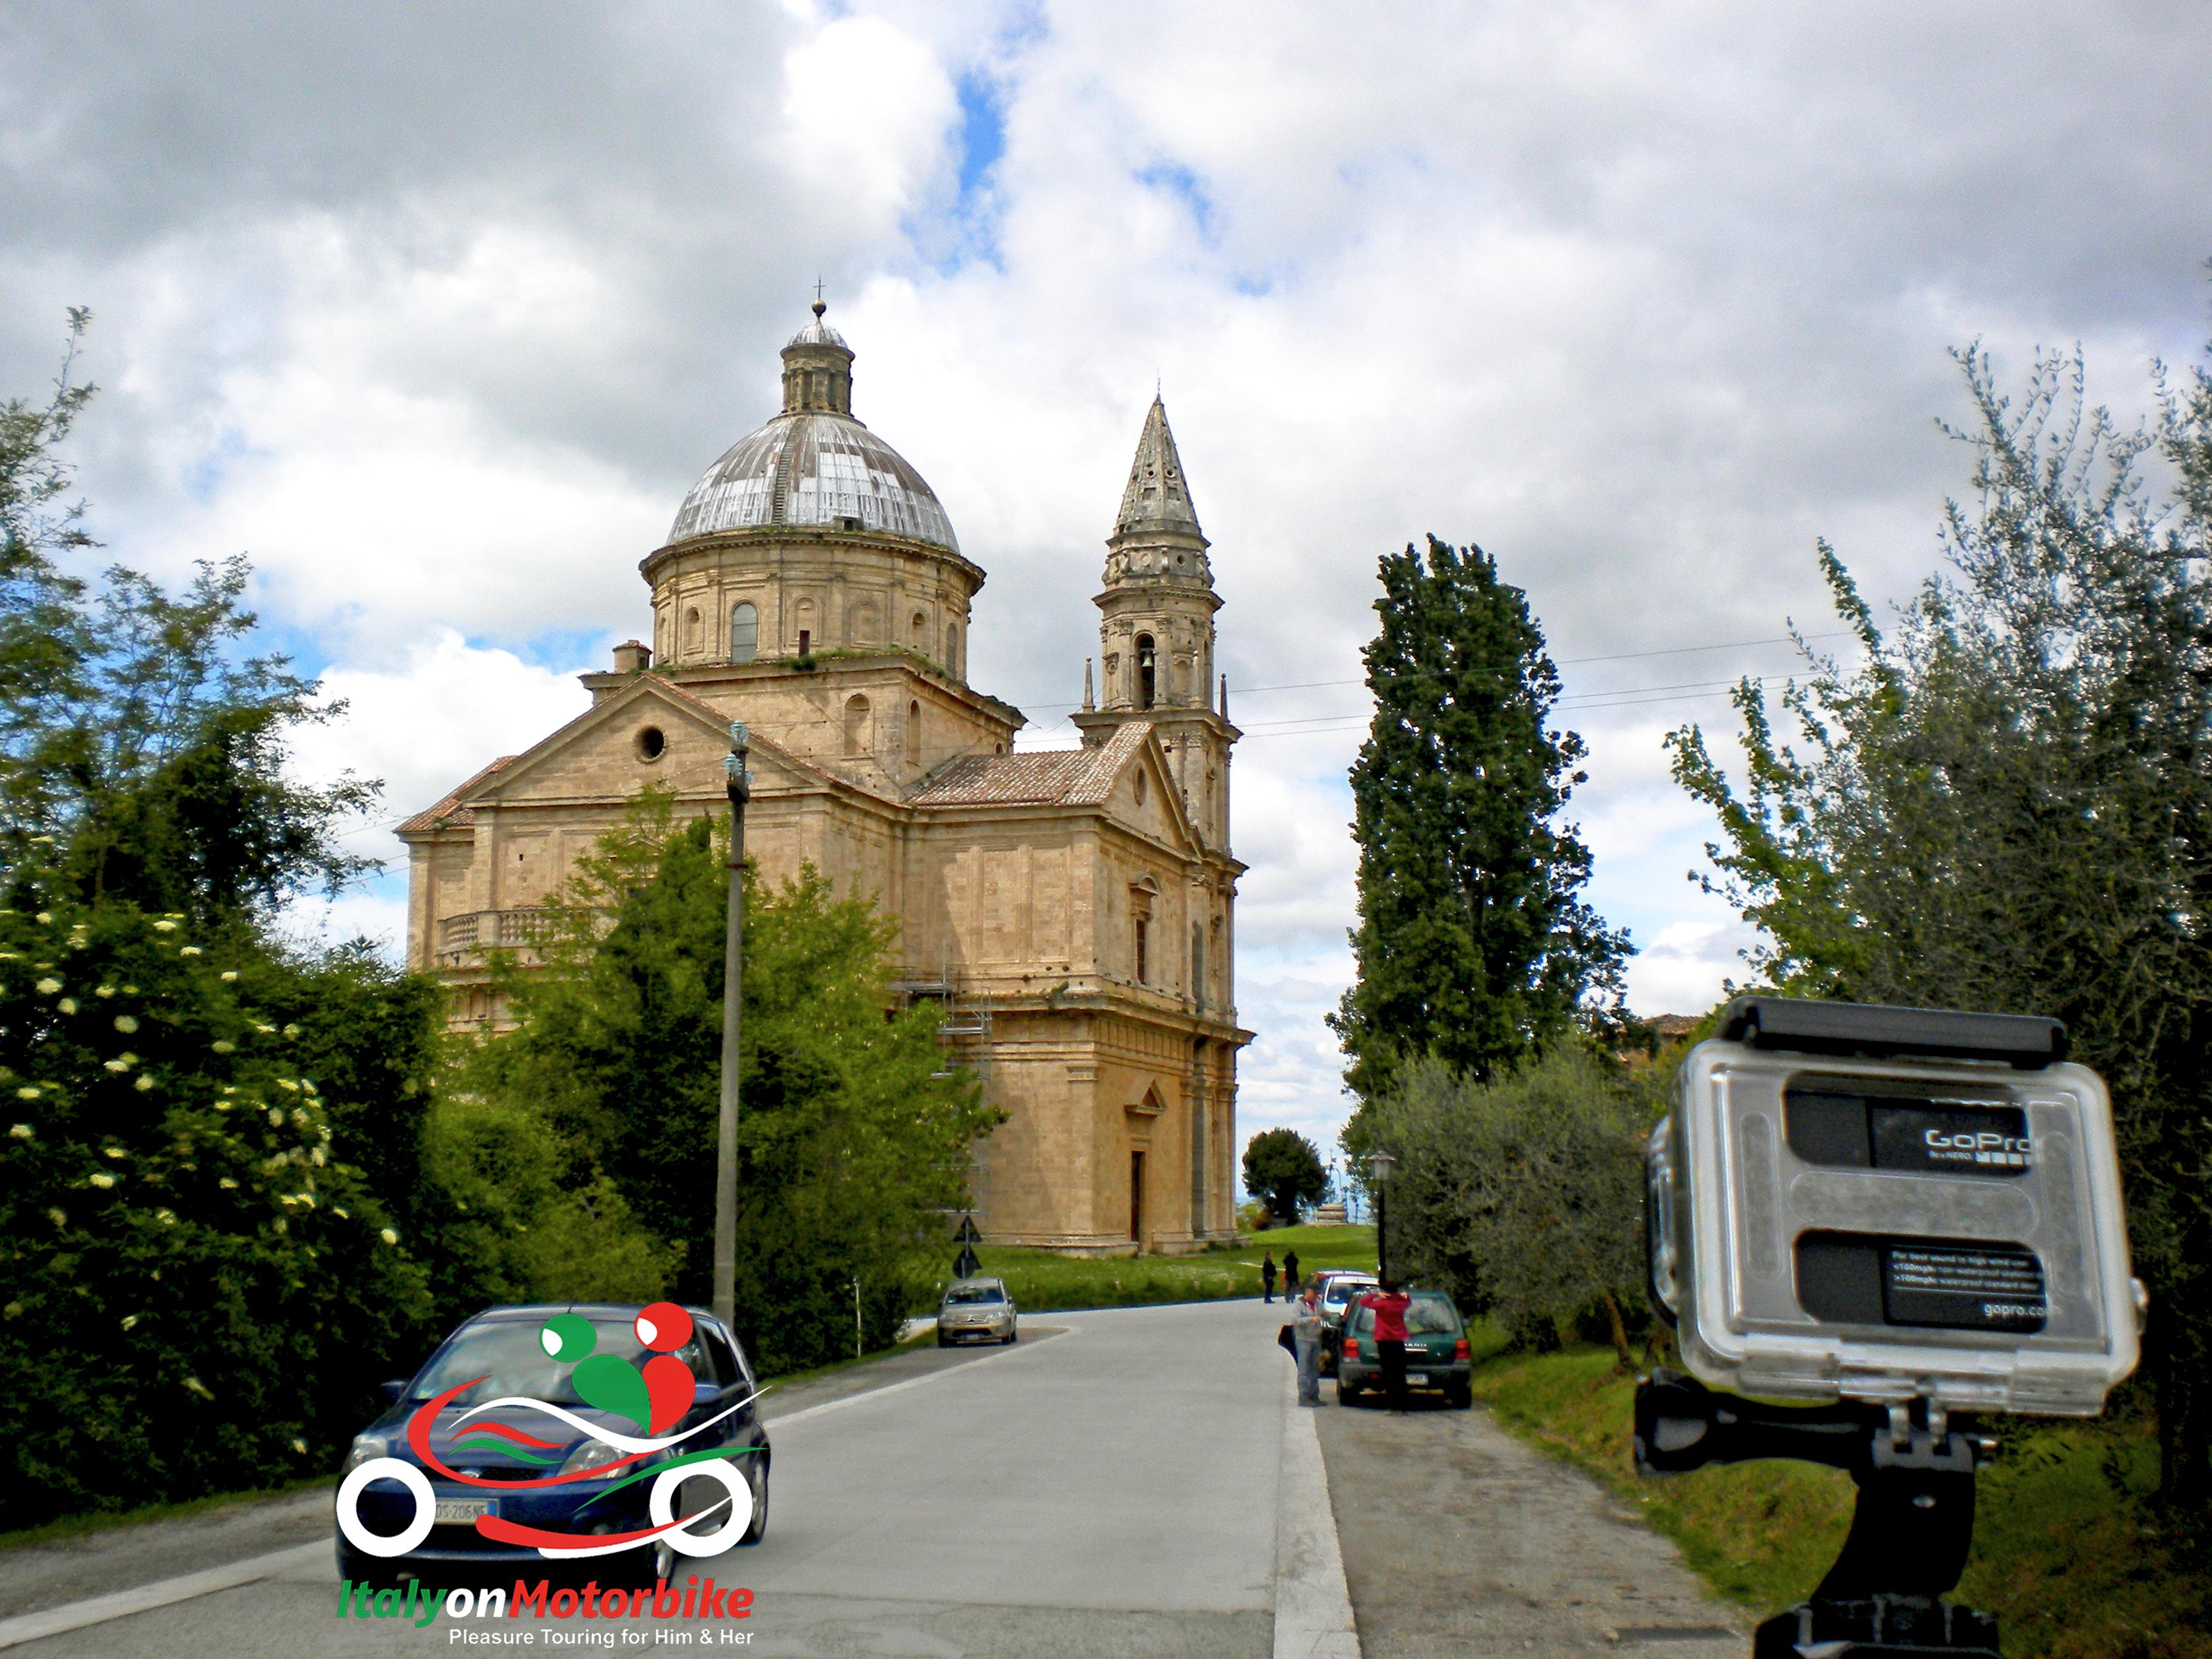 Italy-on-Motorbike-210